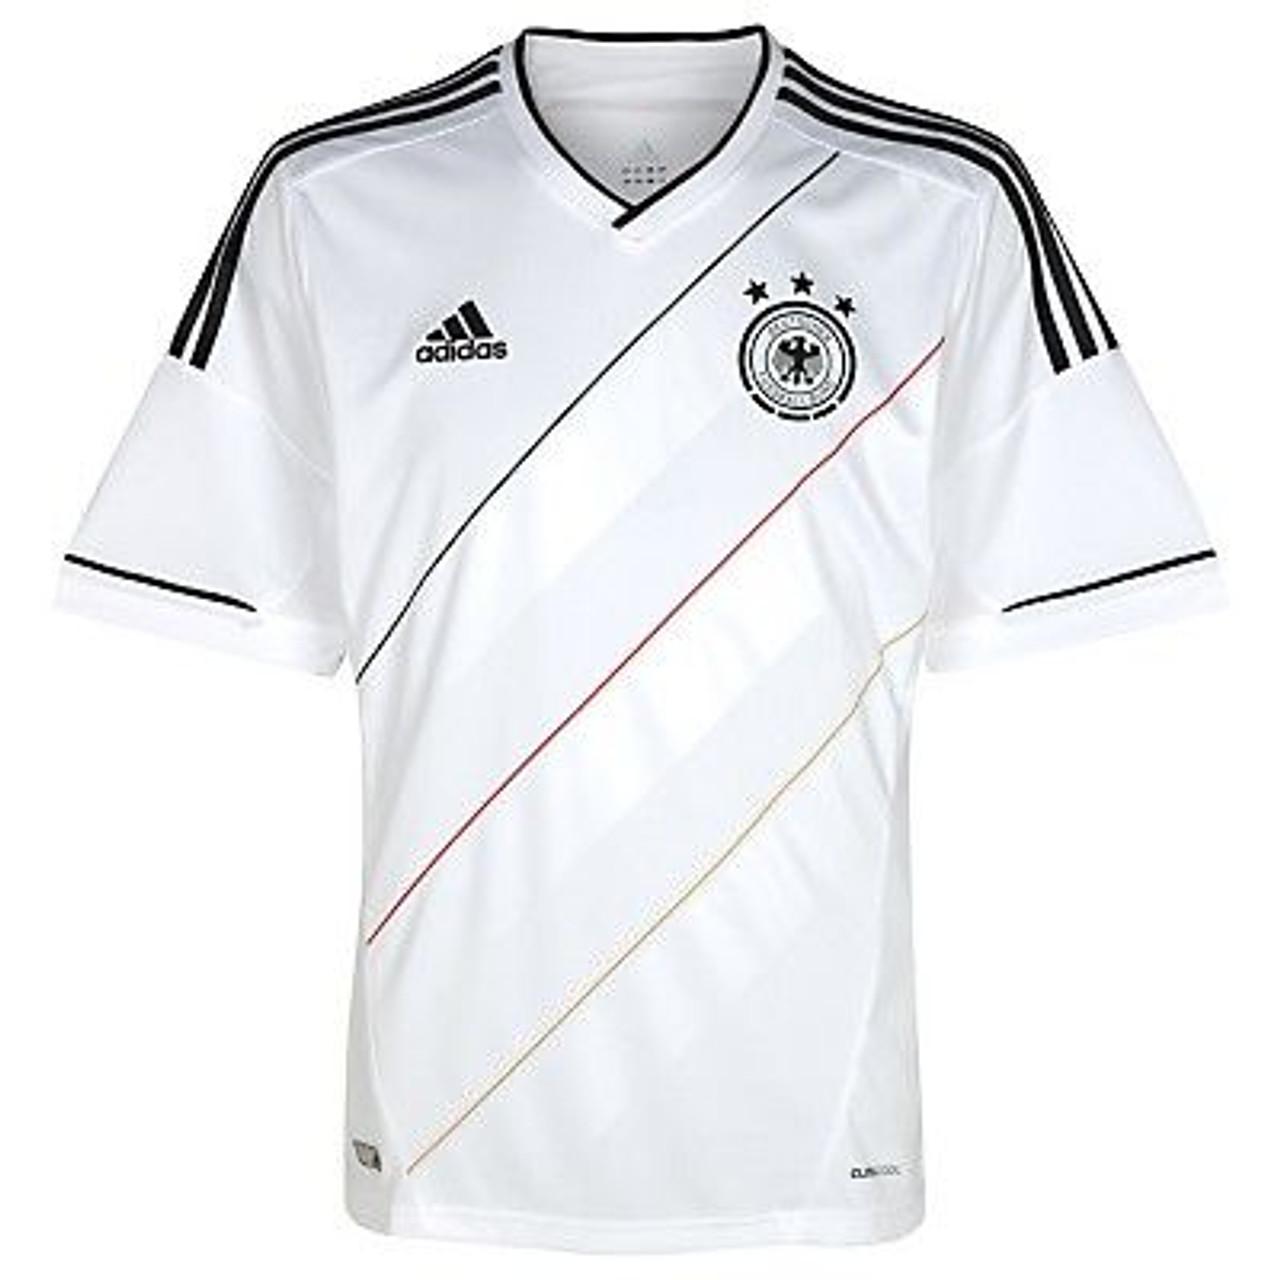 adidas germany jersey